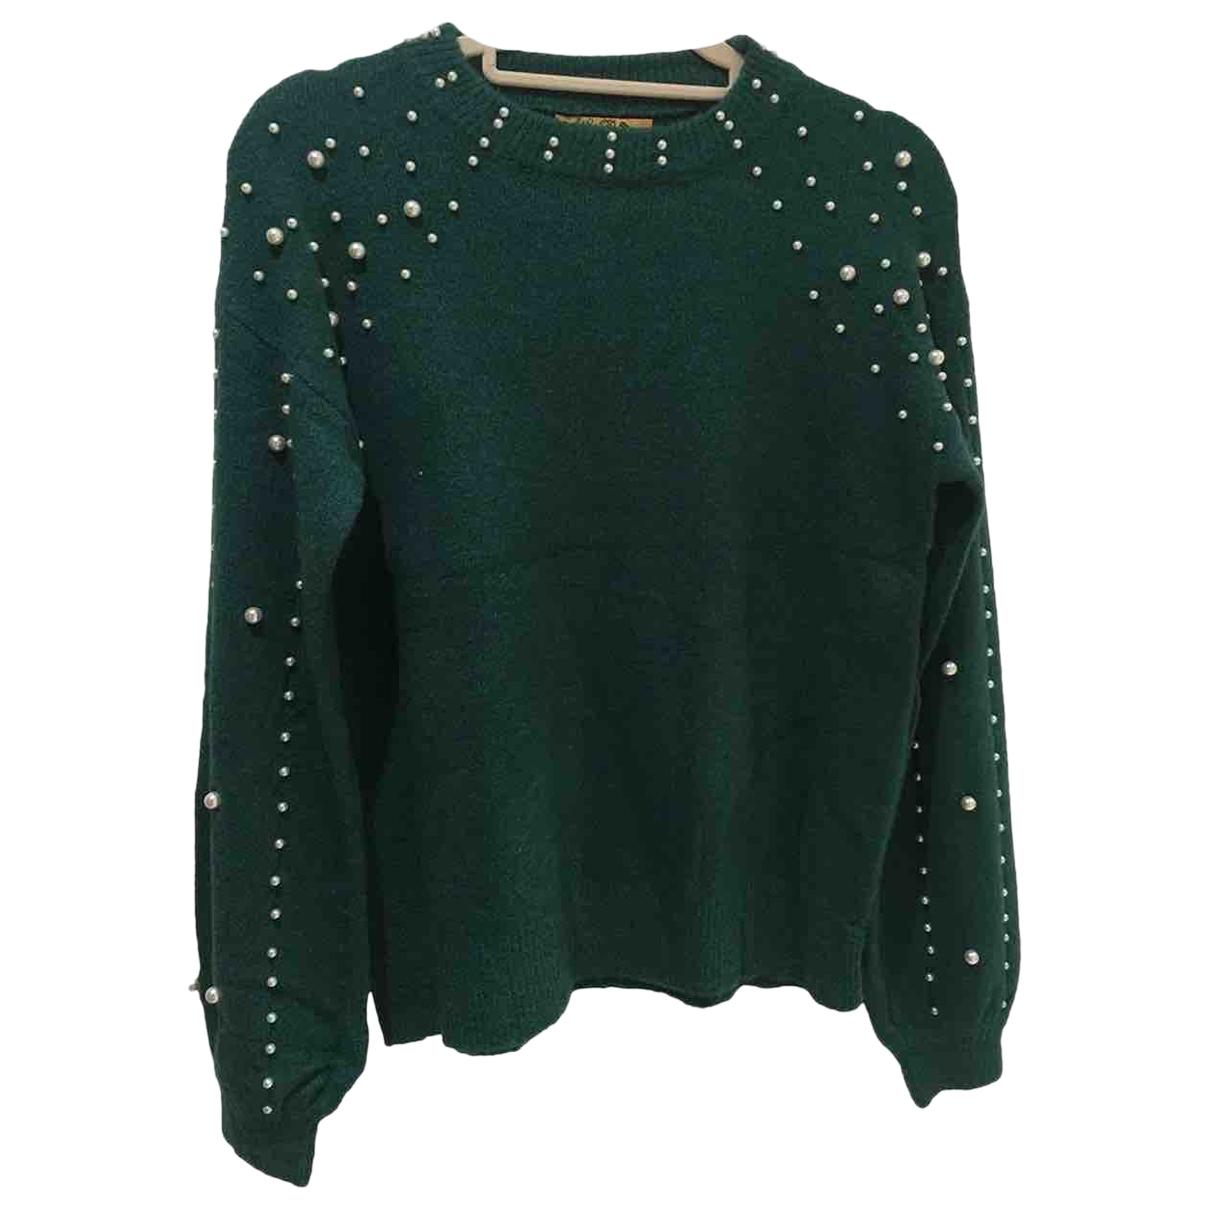 Non Signé / Unsigned Manche ballon Green Knitwear for Women One Size International